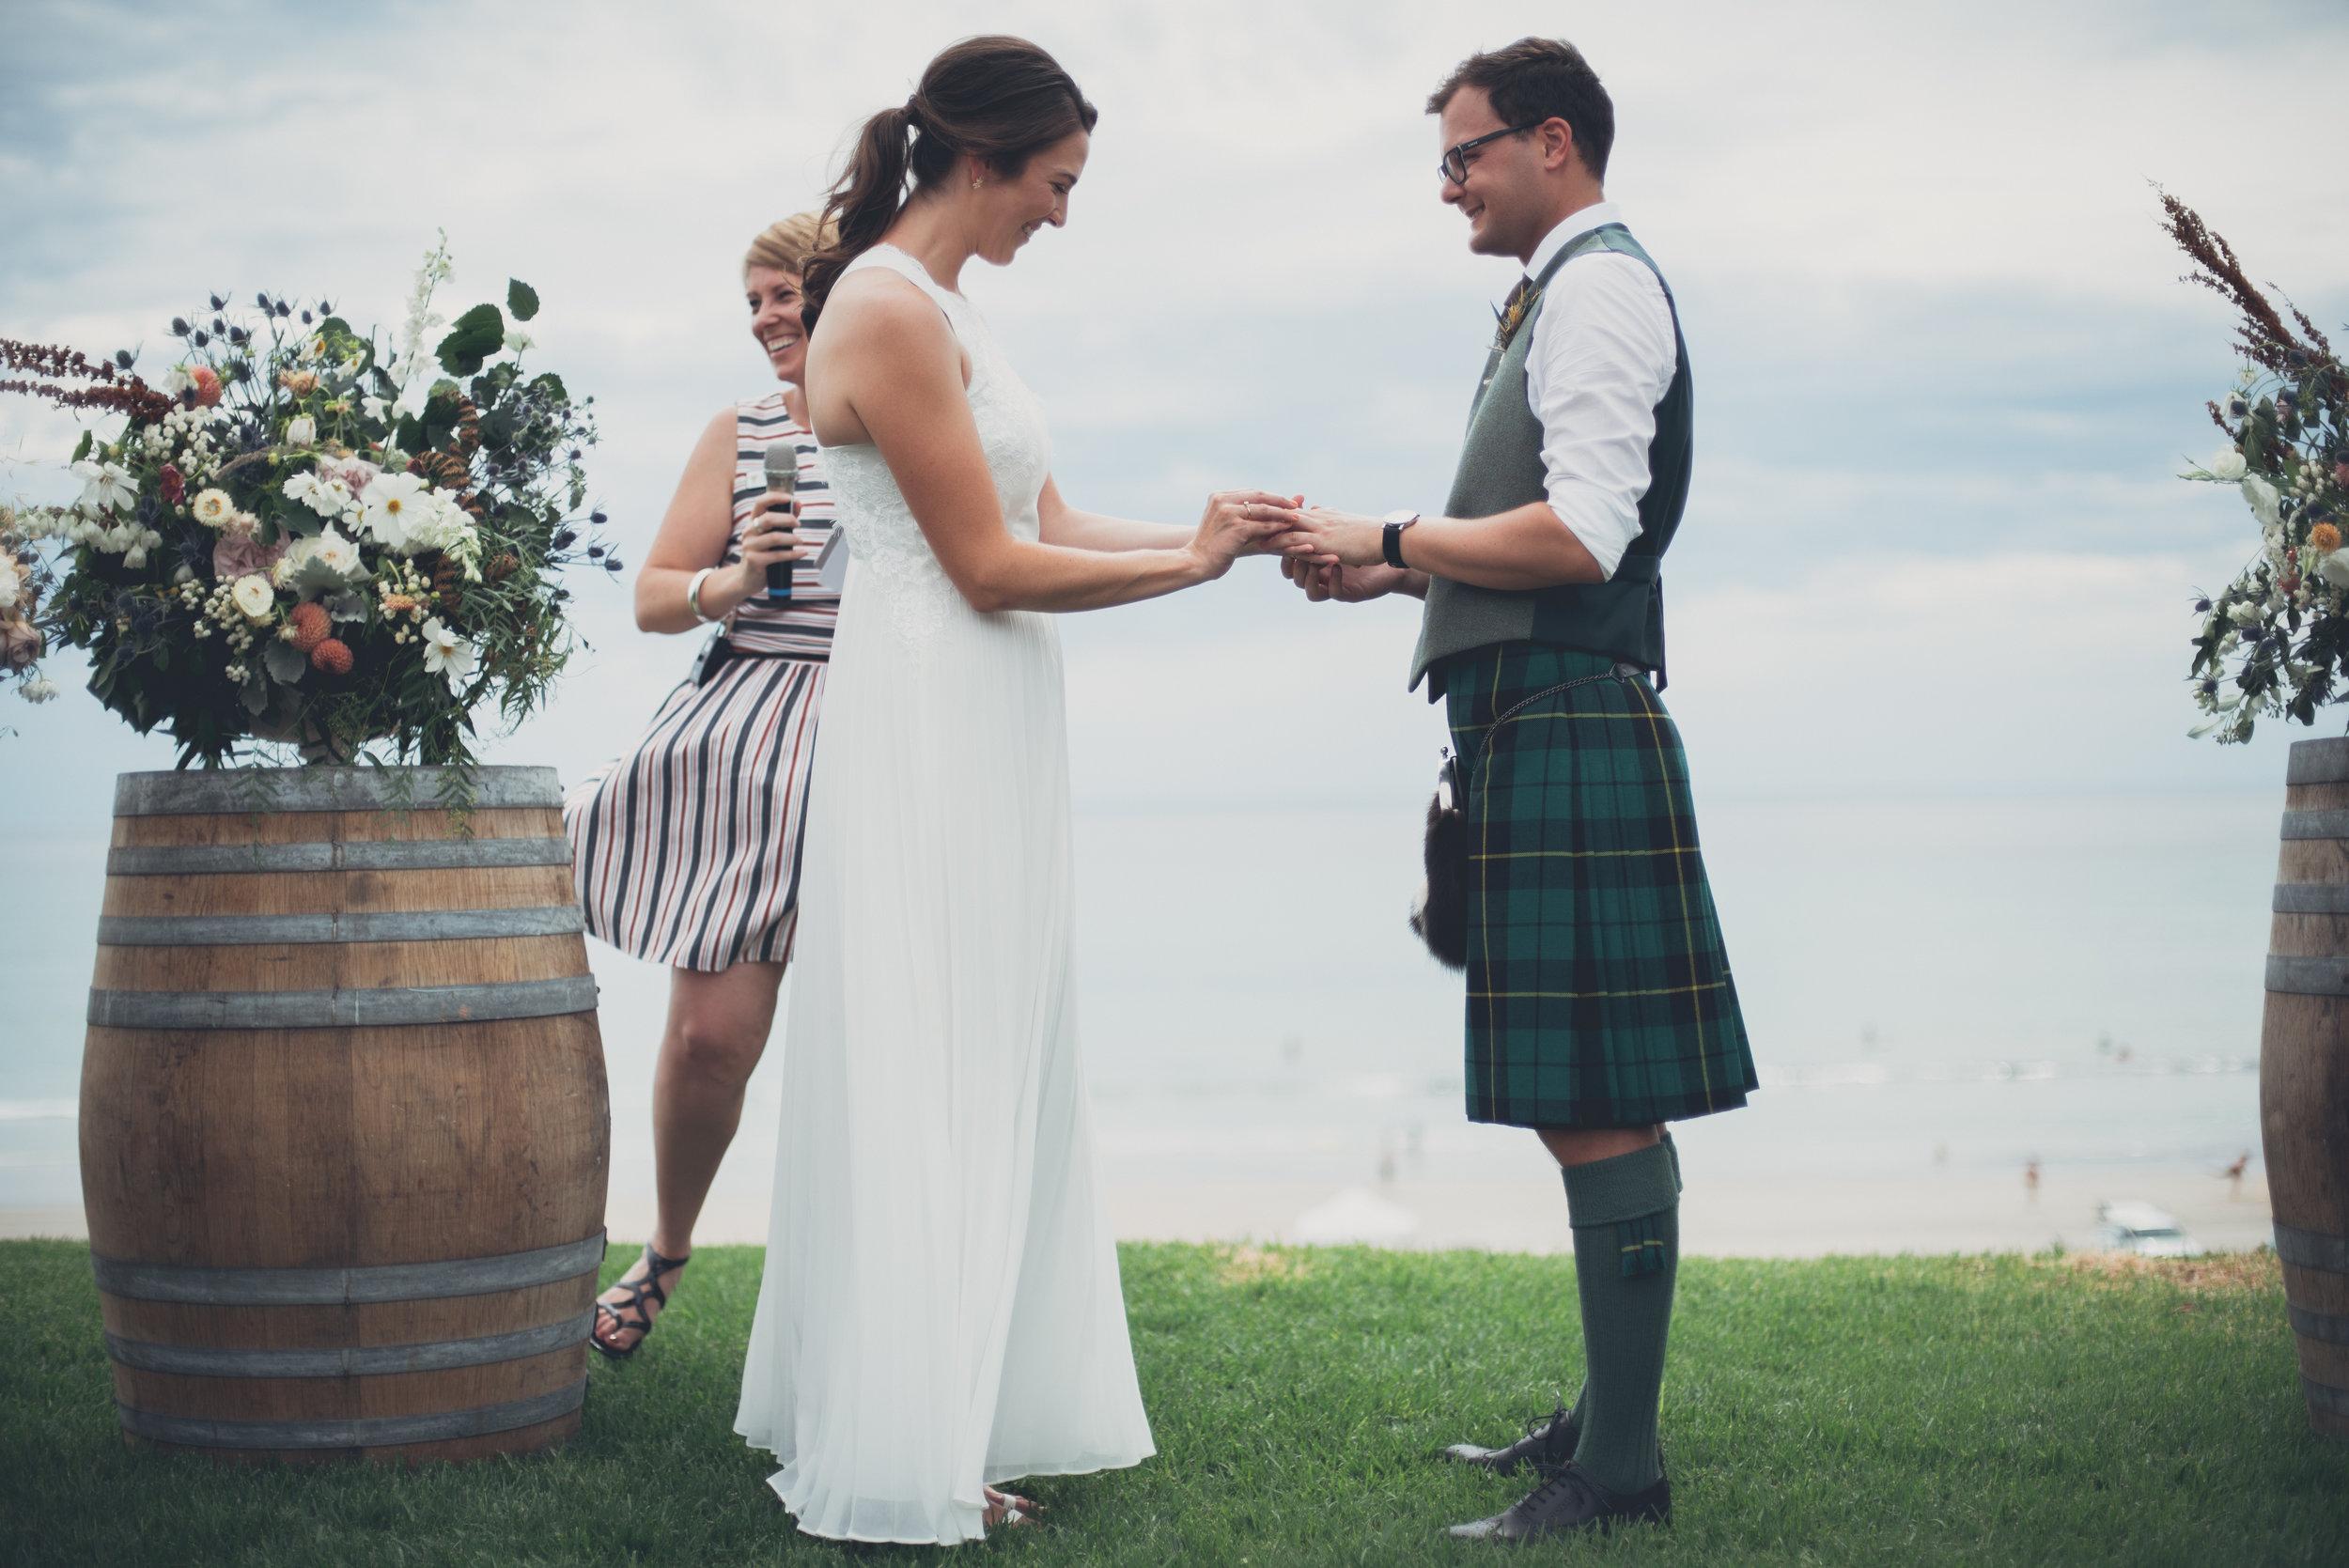 Adelaide Marriage Celebrant